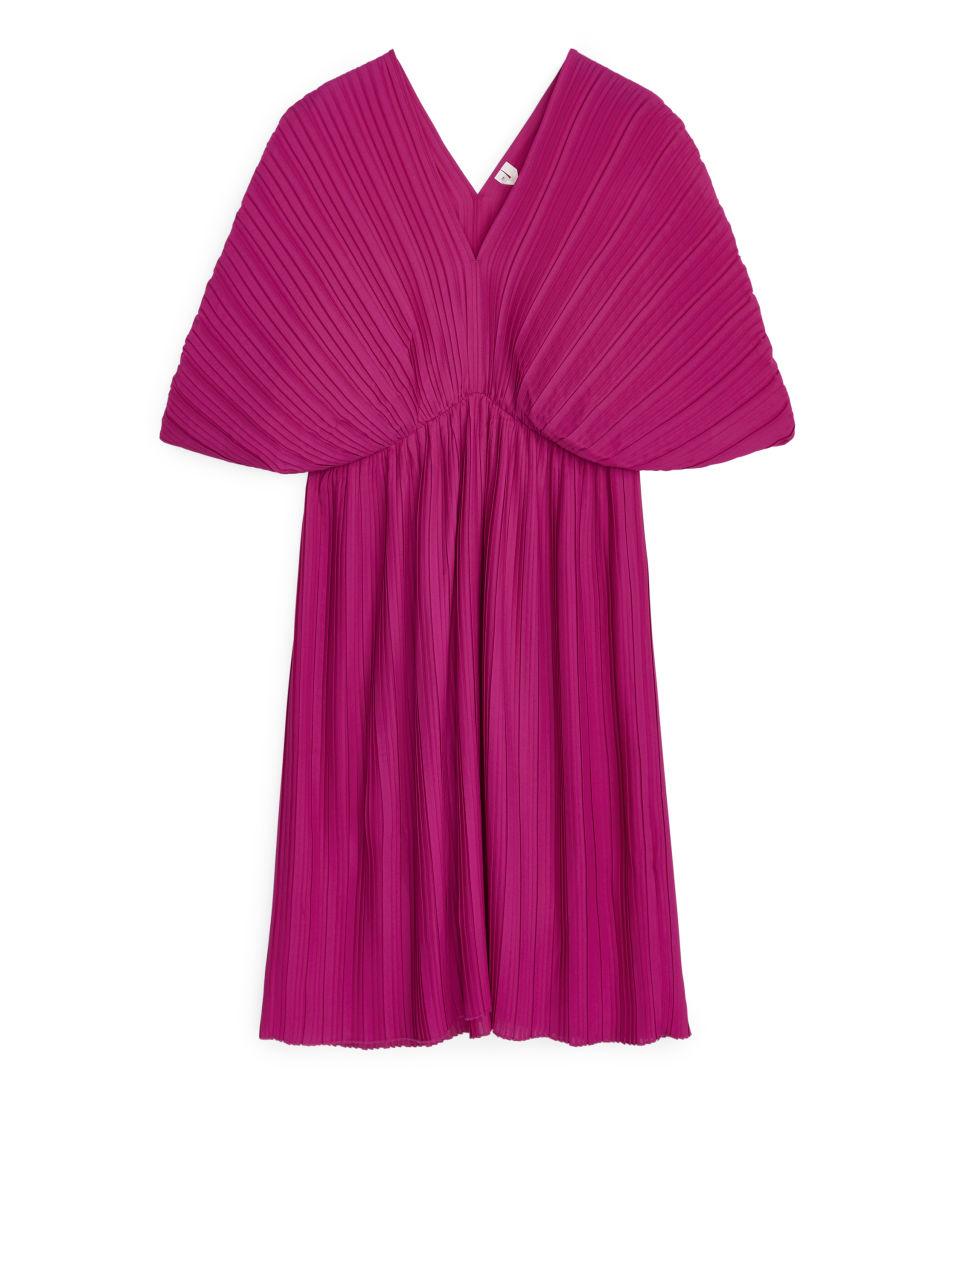 Short Pleated Dress - Pink